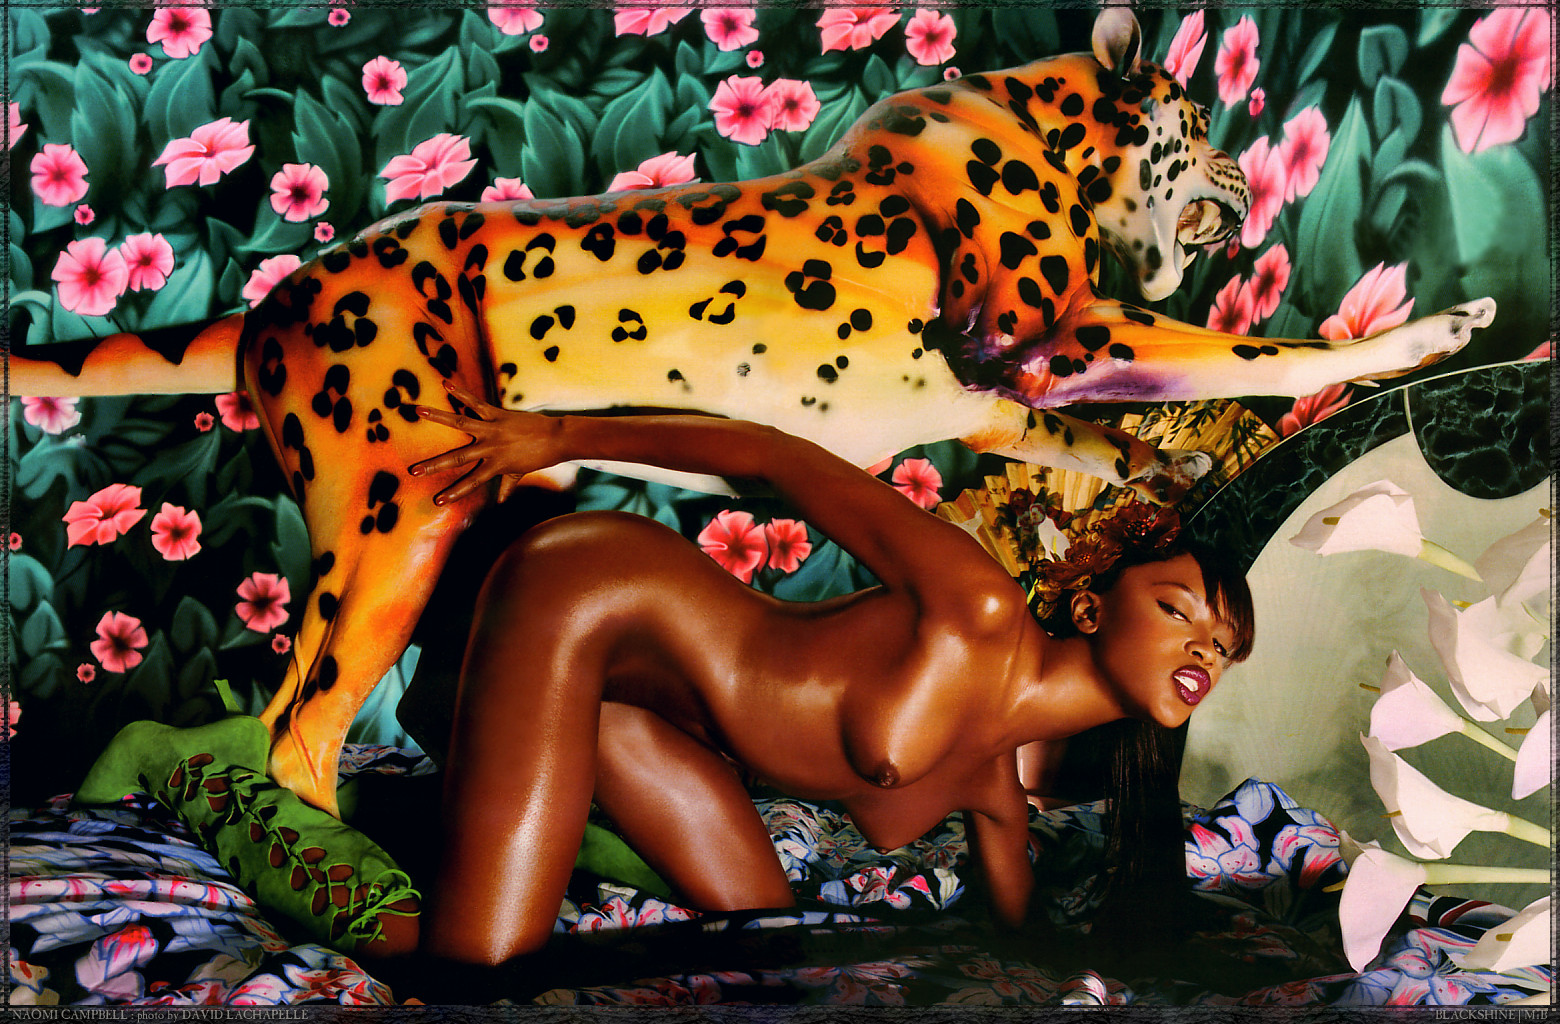 David LaChapelle Naomi